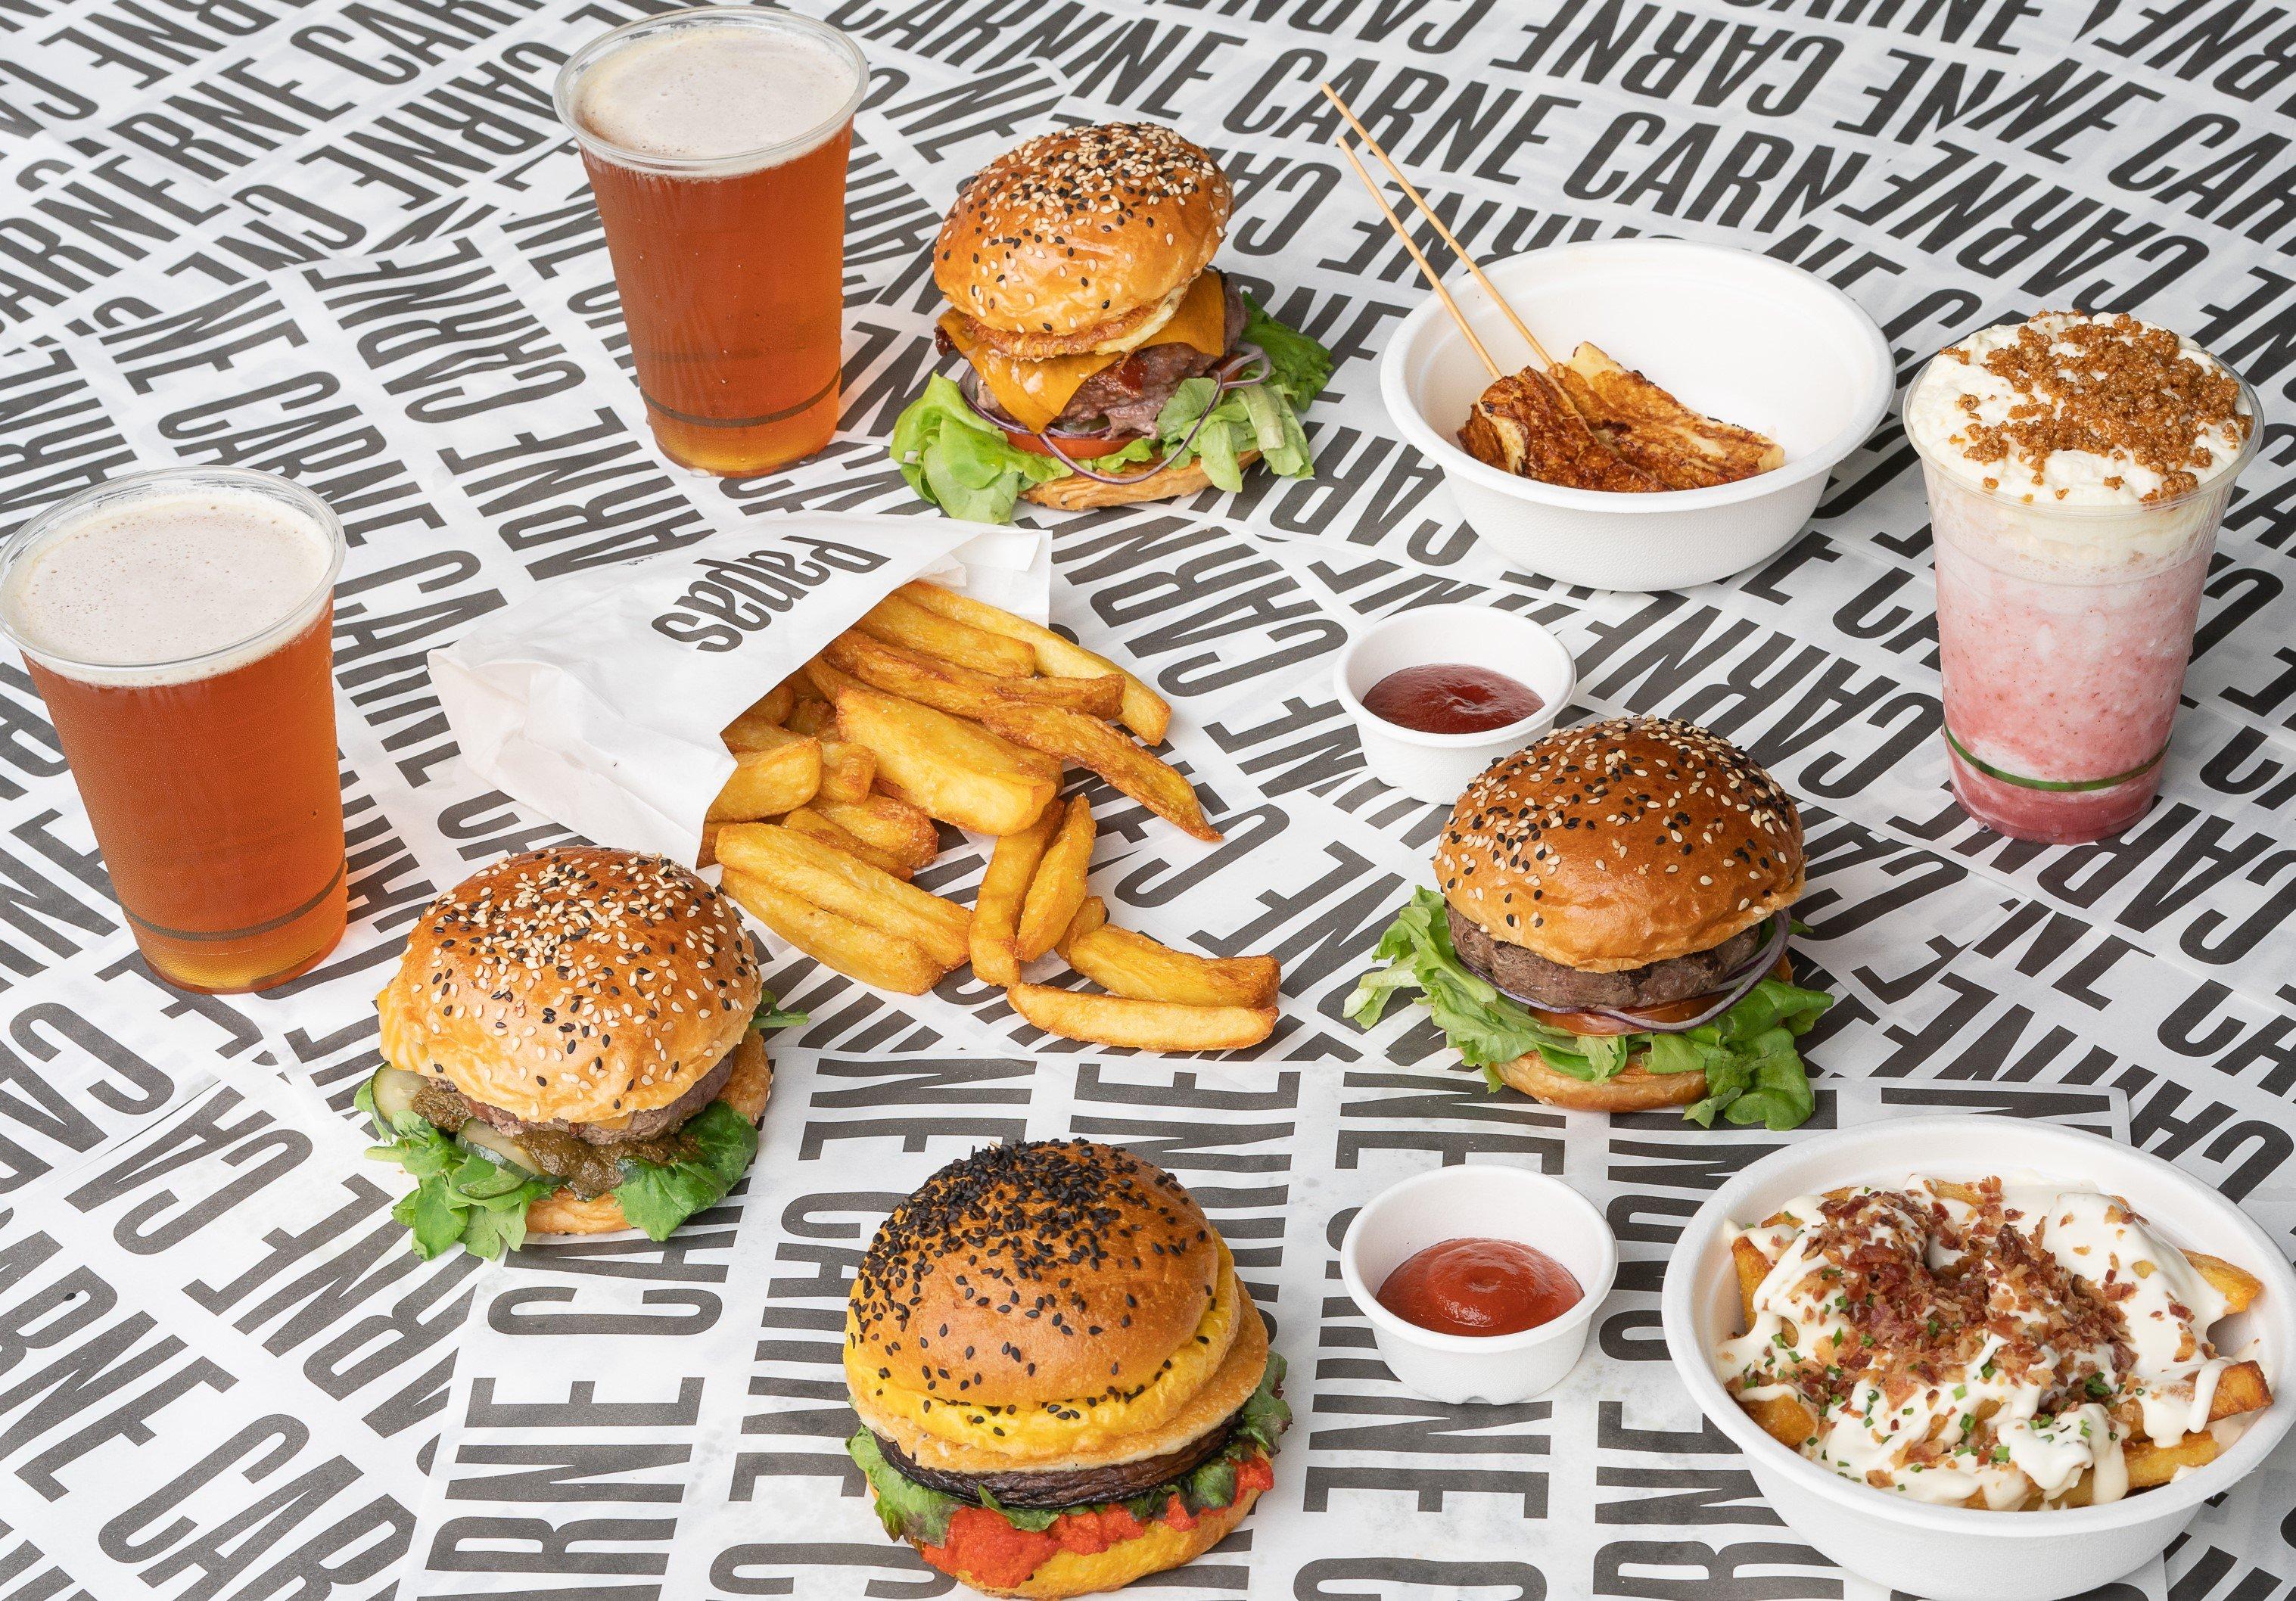 CARNE Burgers & Sides